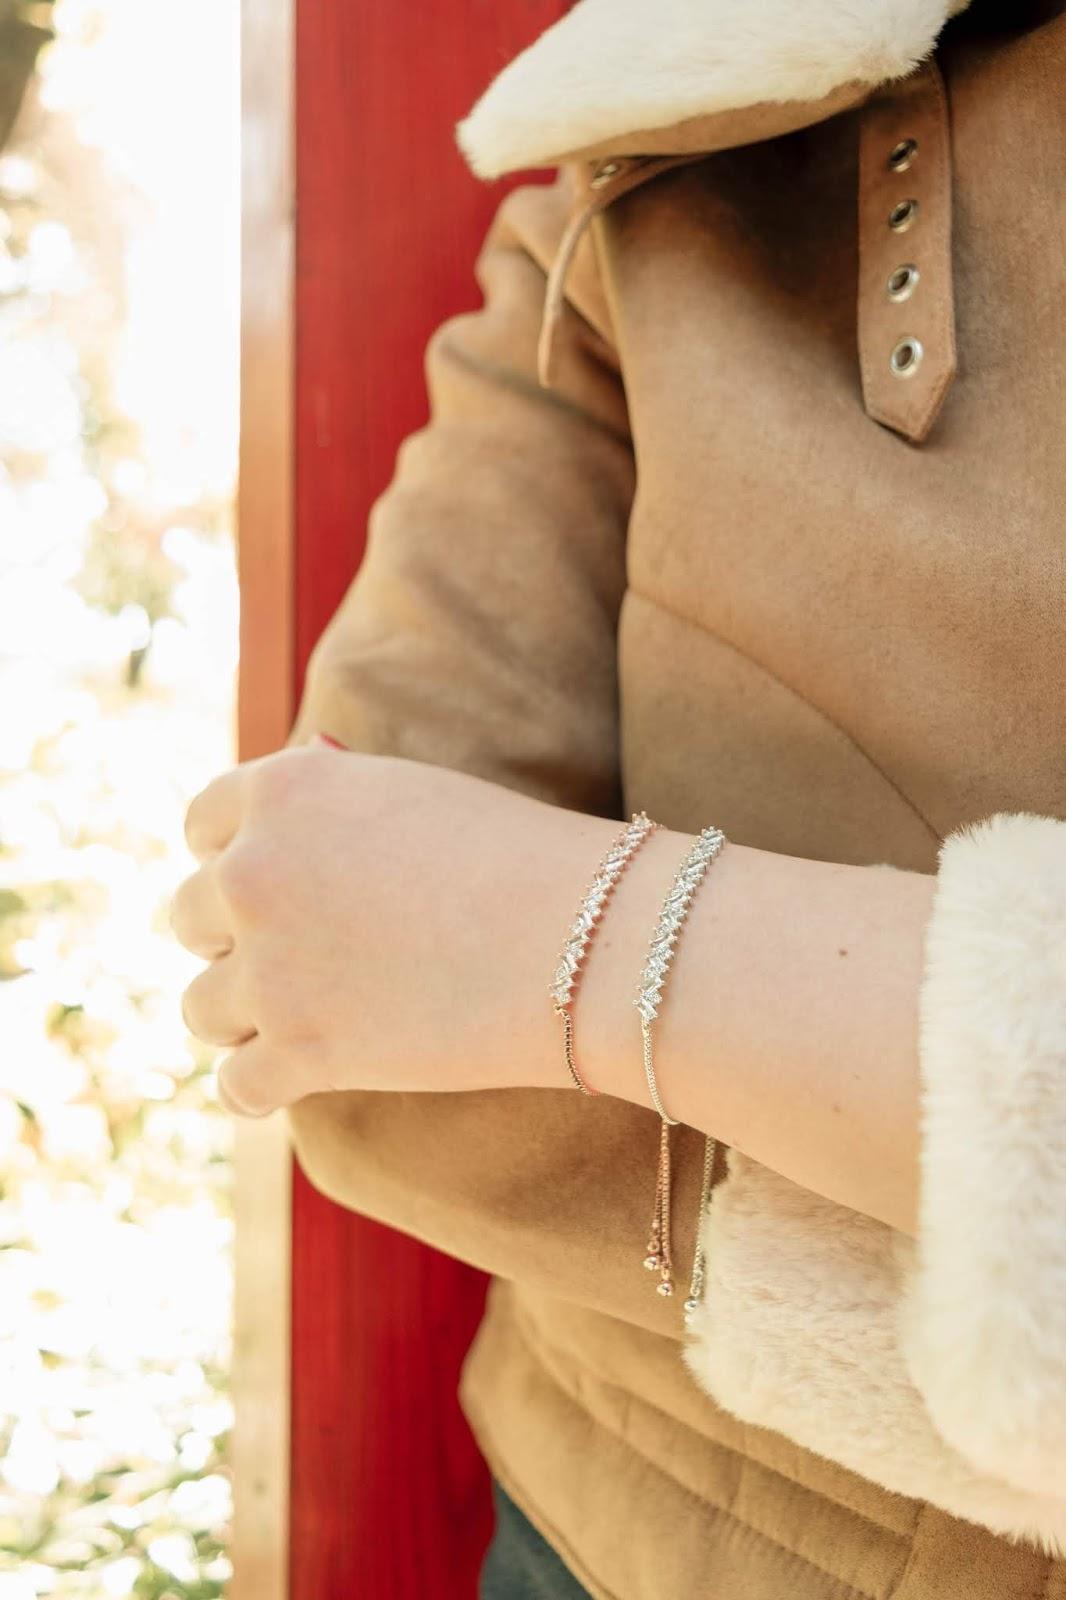 Crystal bracelets that fasten